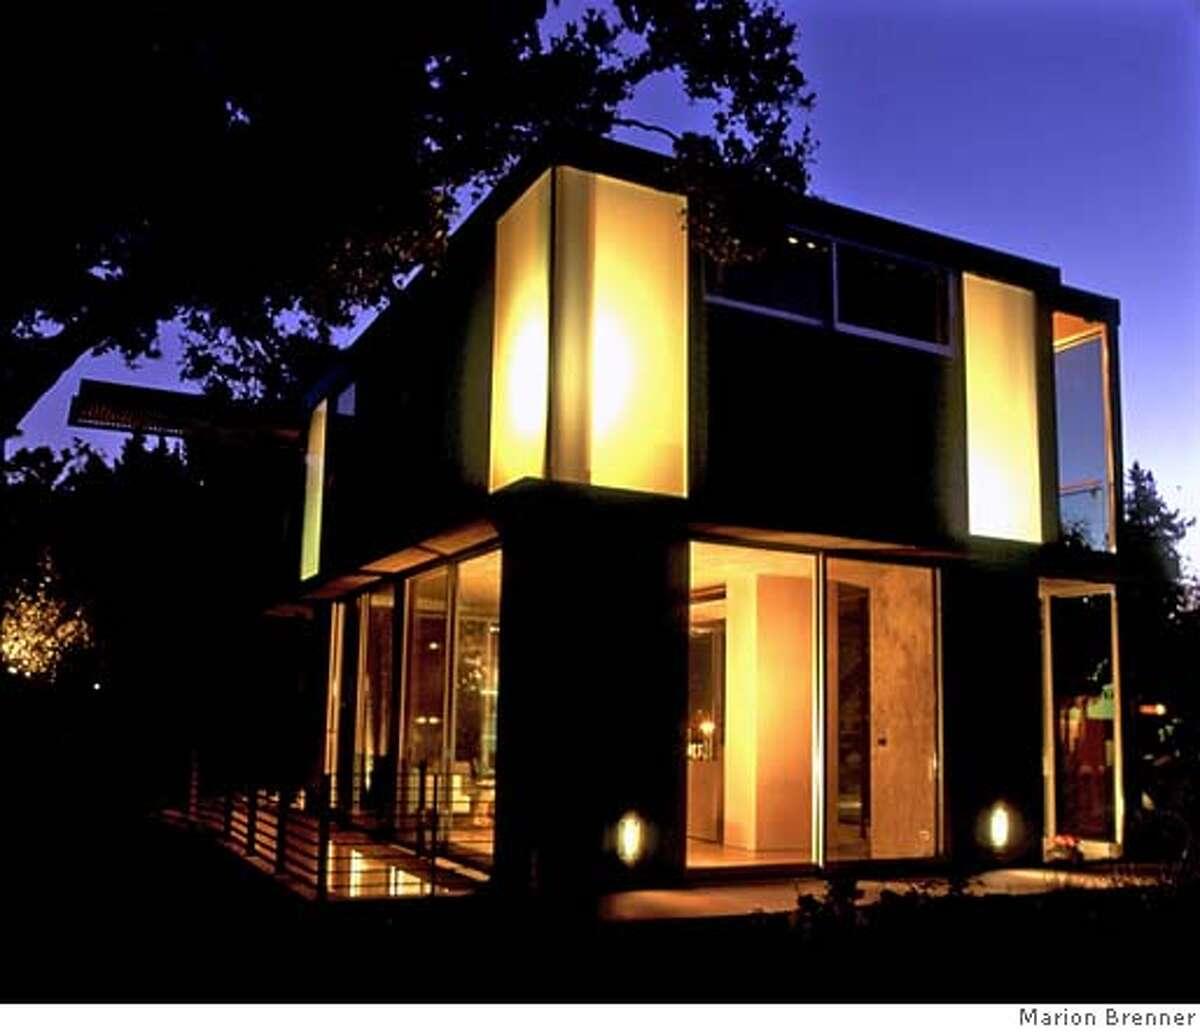 Architect Joseph Bellomo's lanternlike Palo Alto house is designed to fit perfectly under a landmark oak tree. Photo by Marion Brenner